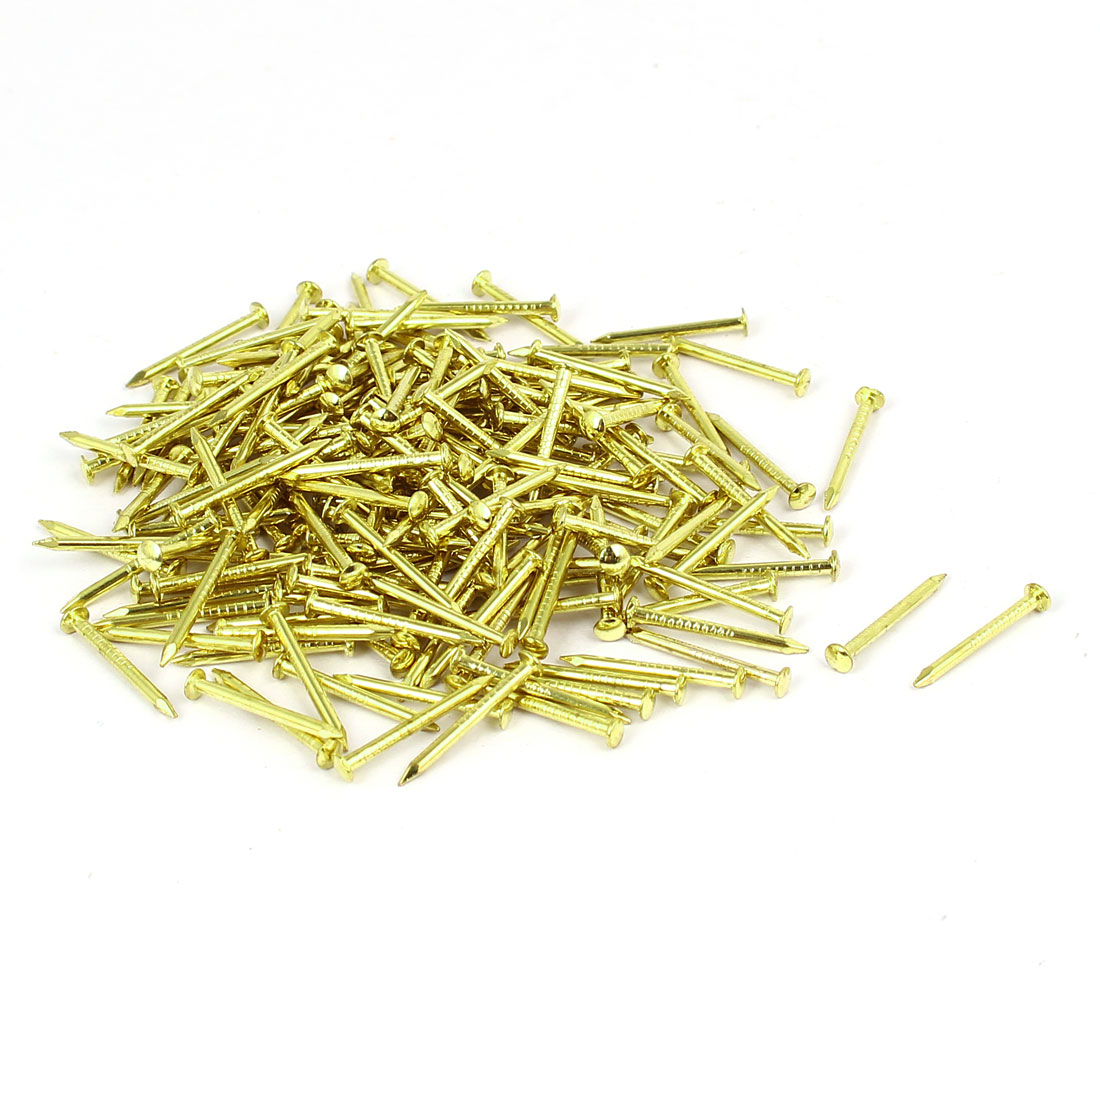 Home Furniture Upholstery Thumb Tack Nail Push Pin Gold Tone 3mm x 17mm 200pcs